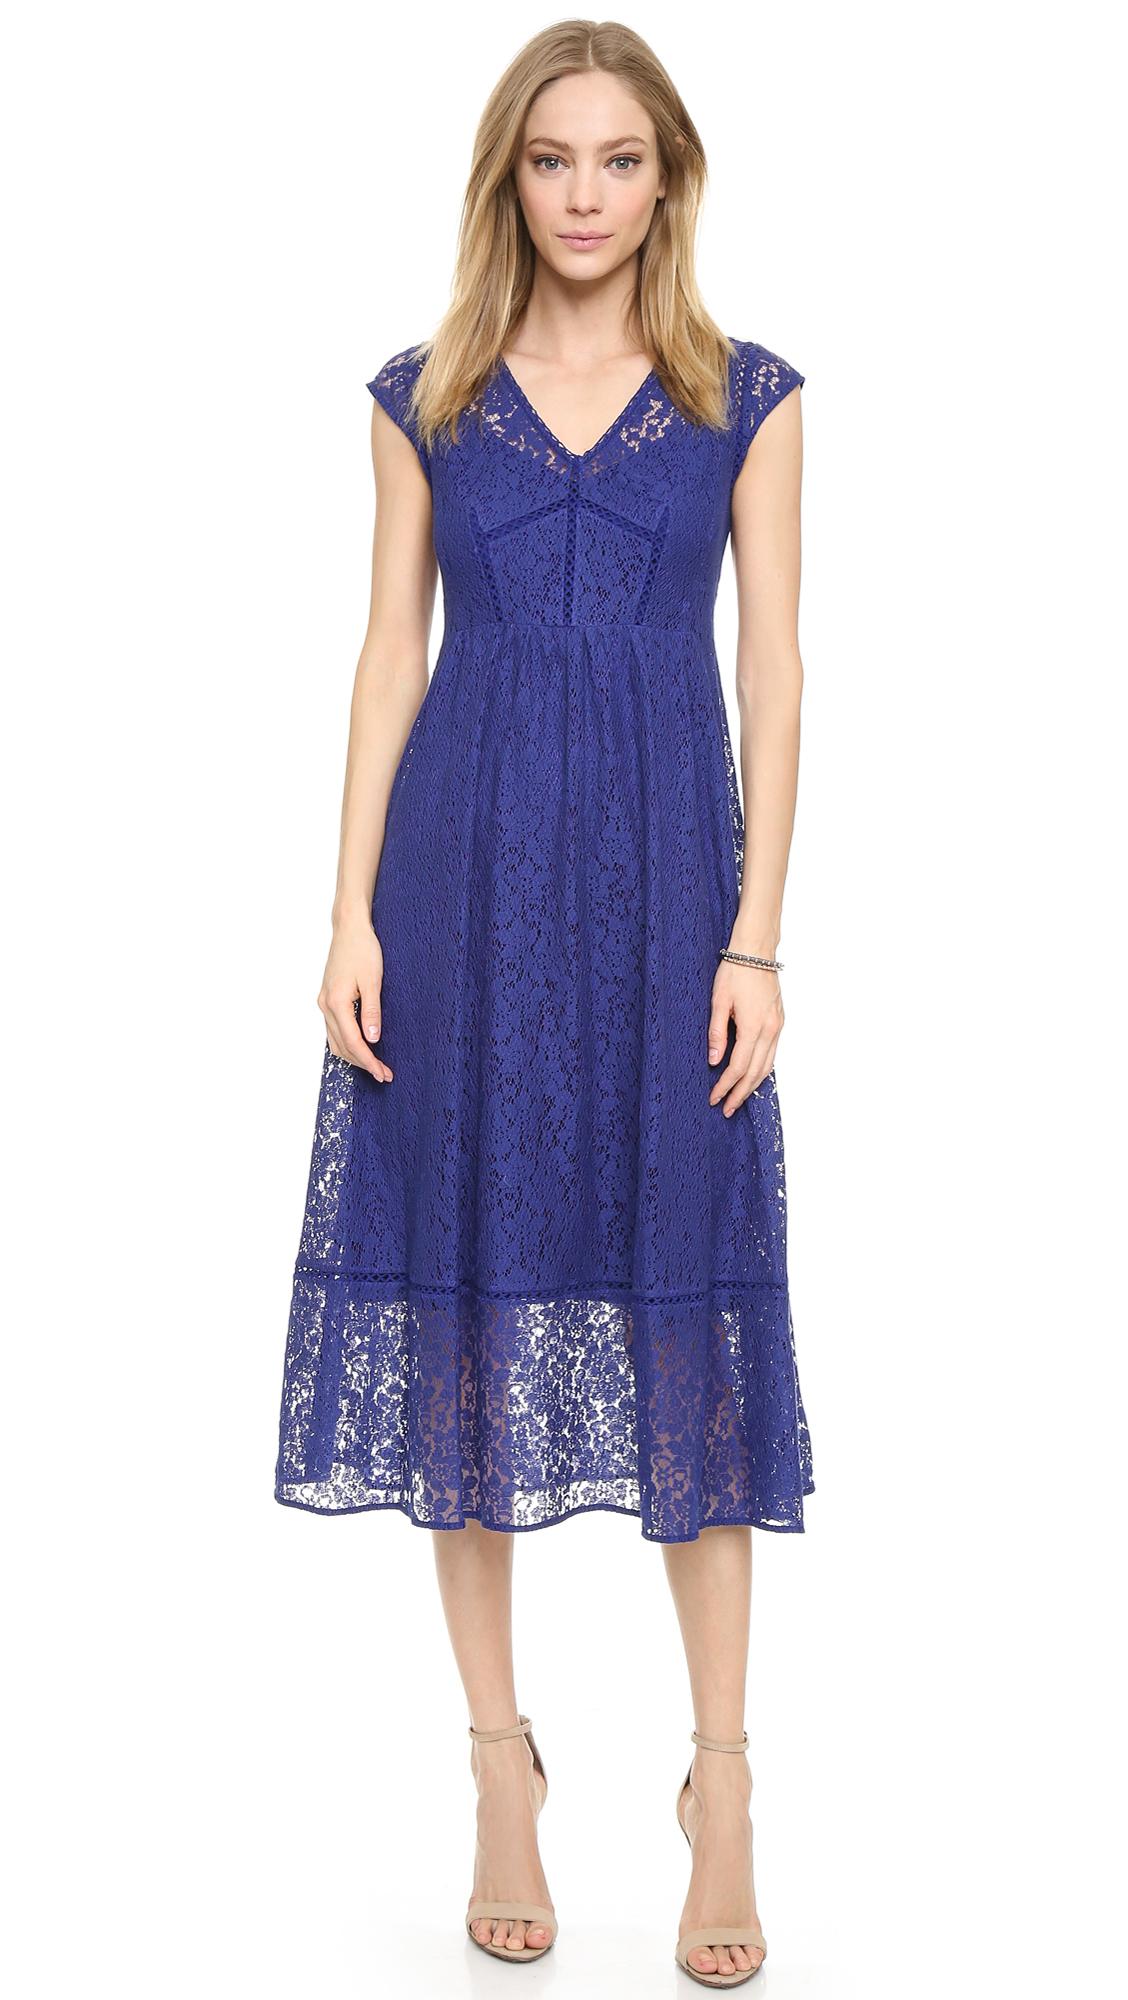 Blue crush clothing store